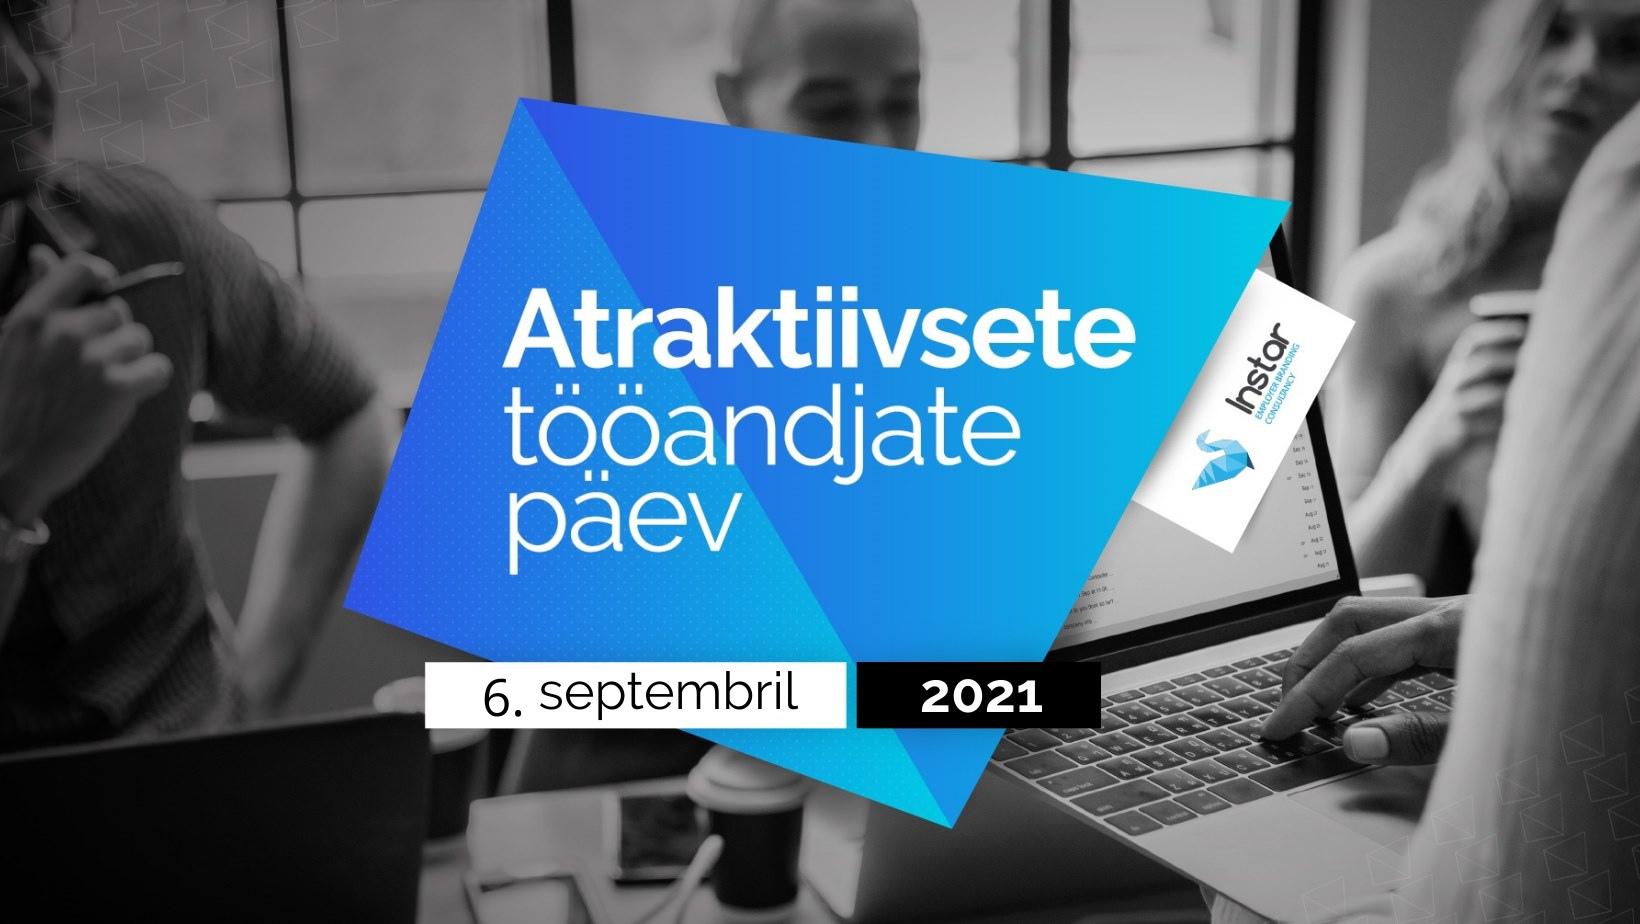 Atraktiivsete Tööandjate Päev 2021